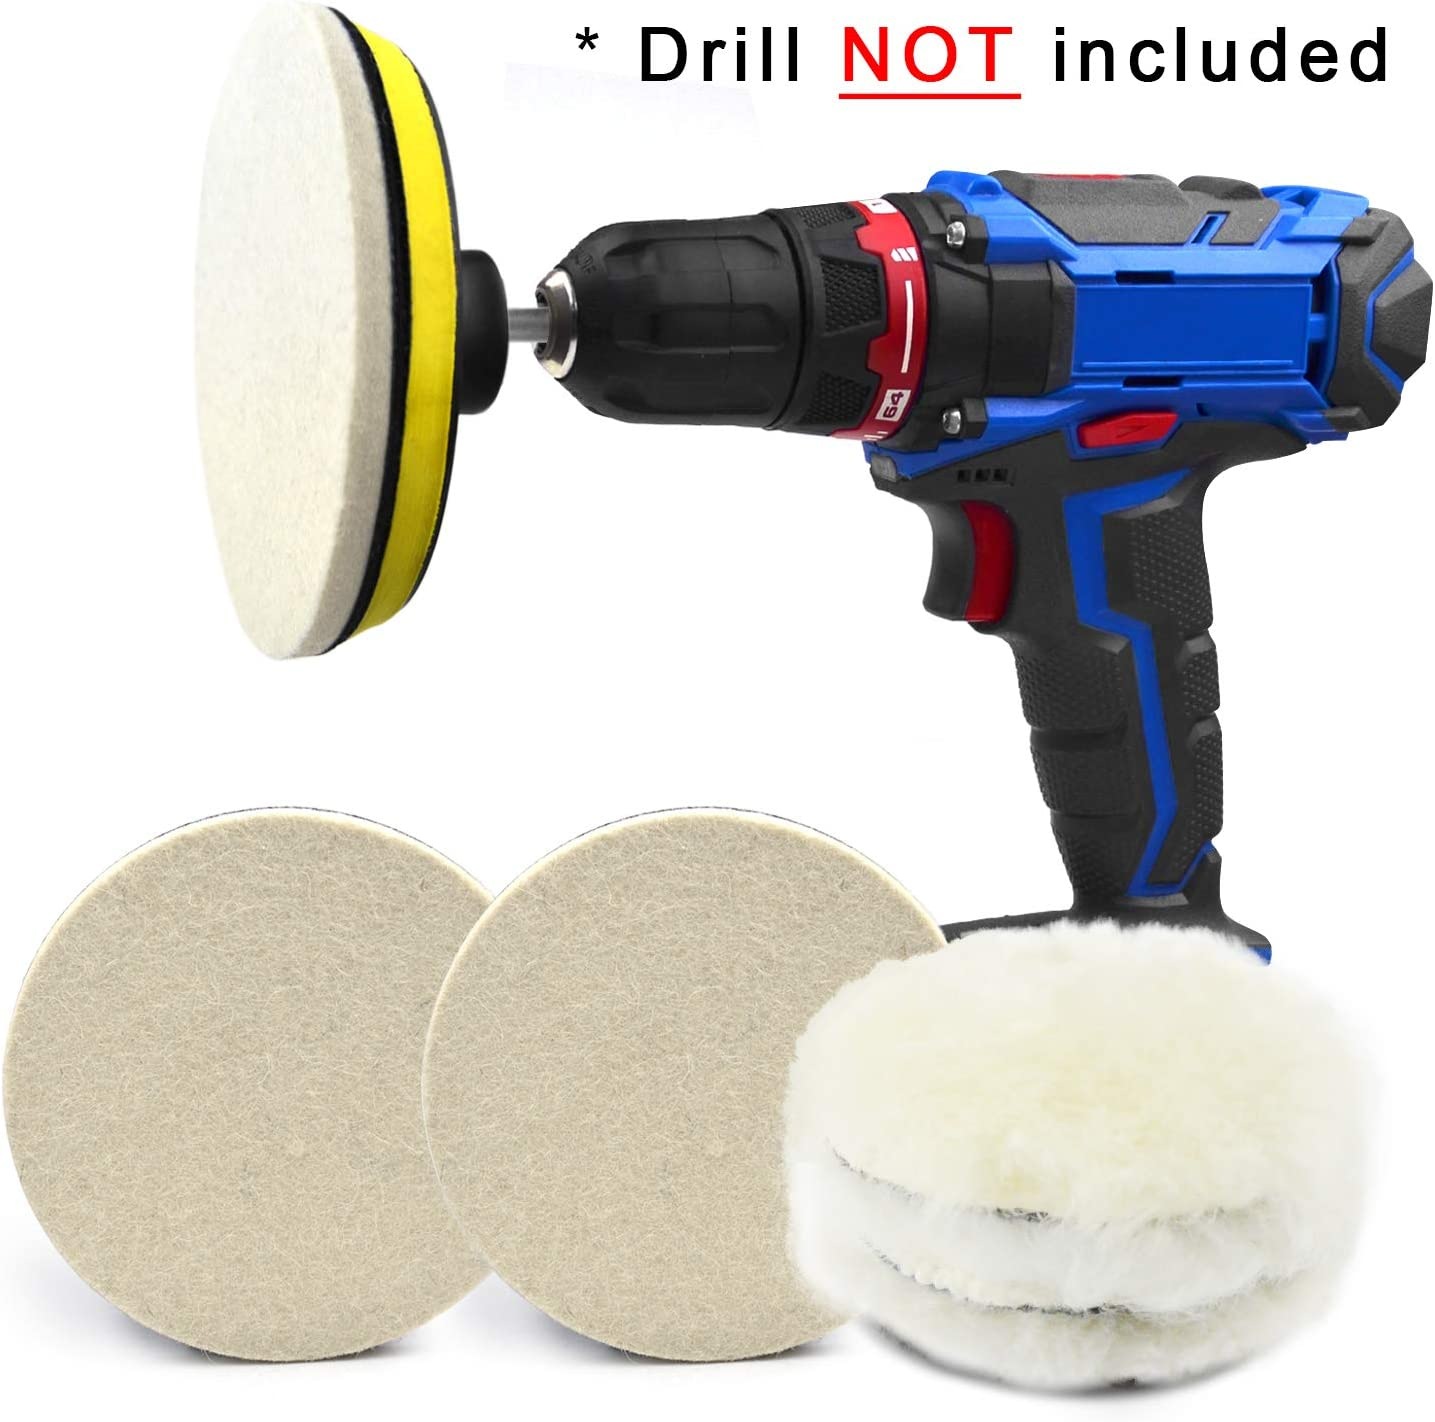 5pcs 5/'/' Wool Wheel Buffing Polishing Pads Car Polisher Drill Wool Wheel Mop Kit